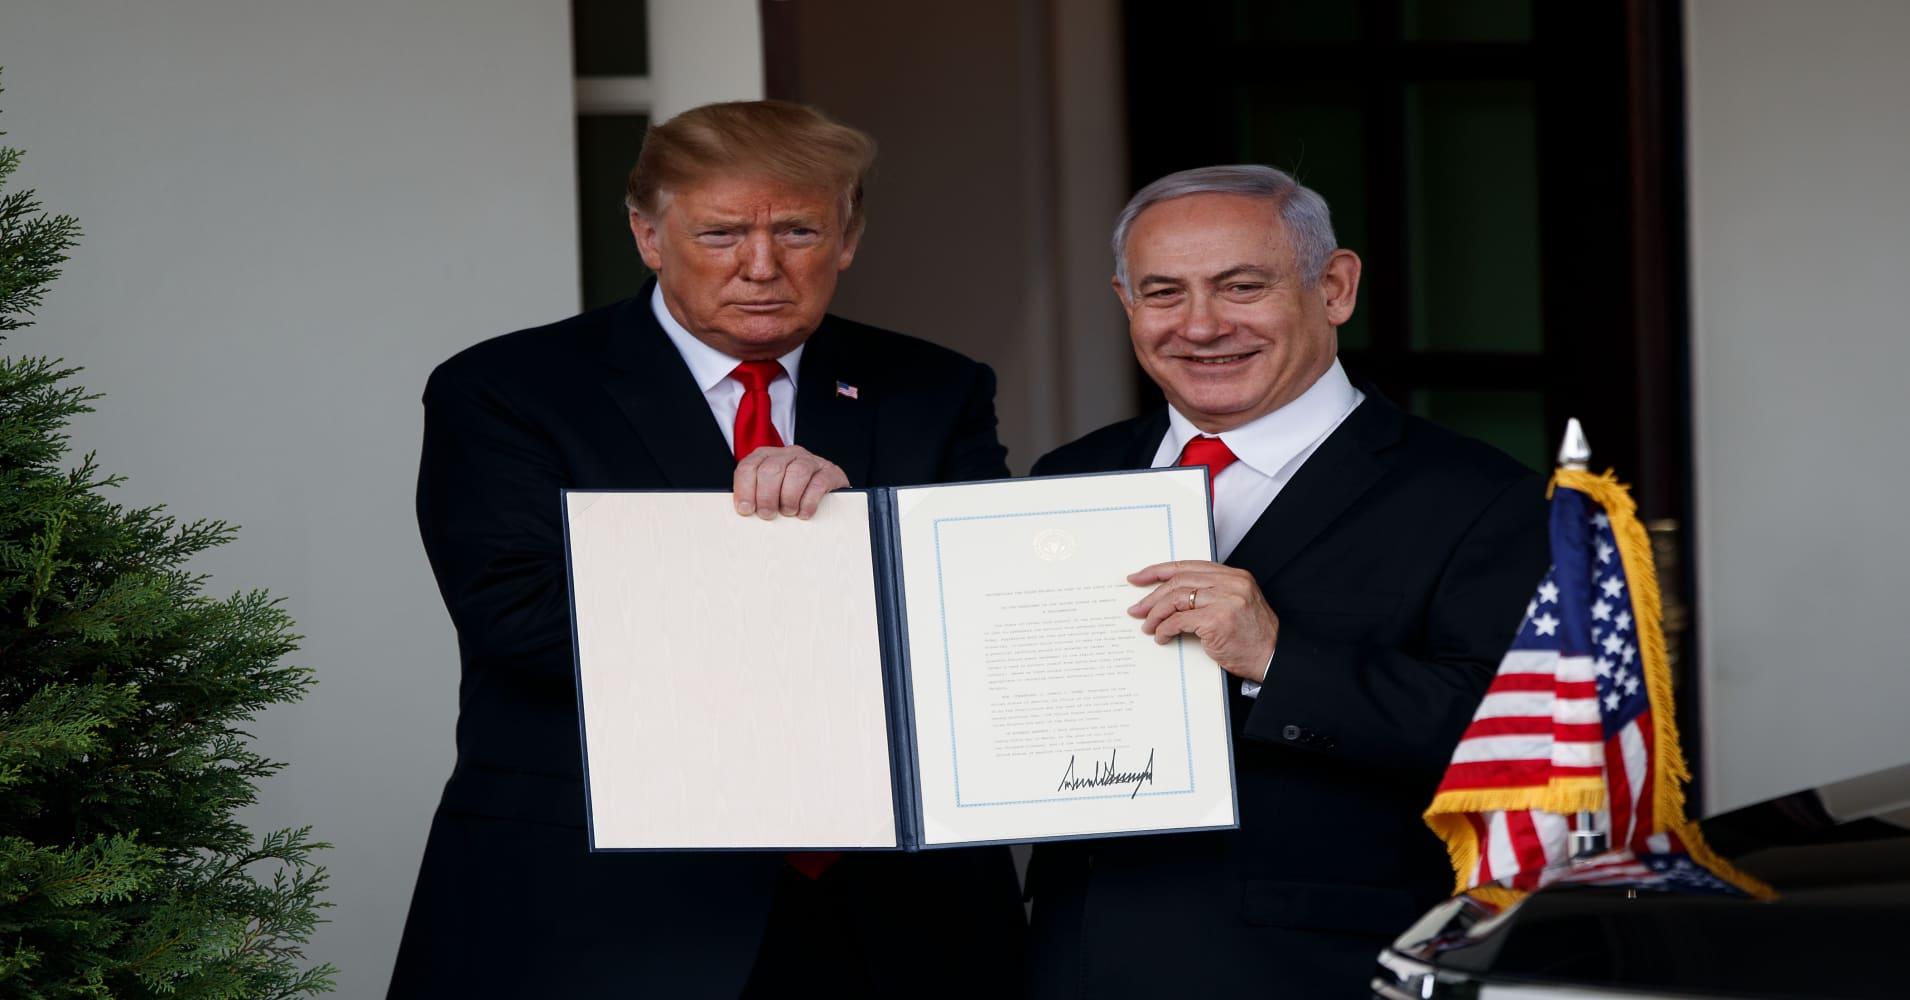 Benjamin Netanyahu wants new Golan Heights town named for Donald Trump